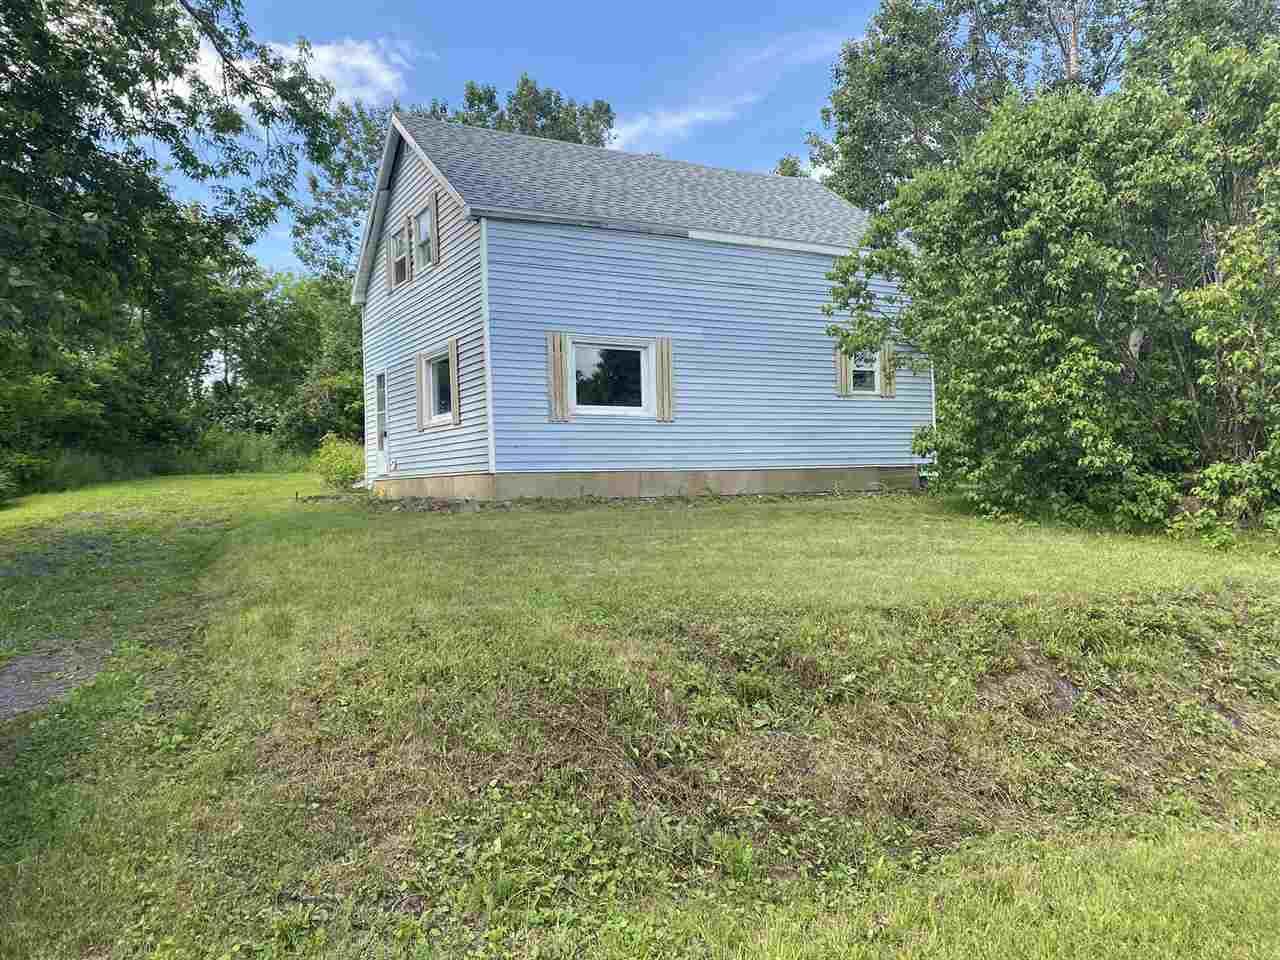 Main Photo: 507 Thorburn Road in Thorburn: 108-Rural Pictou County Residential for sale (Northern Region)  : MLS®# 202013808